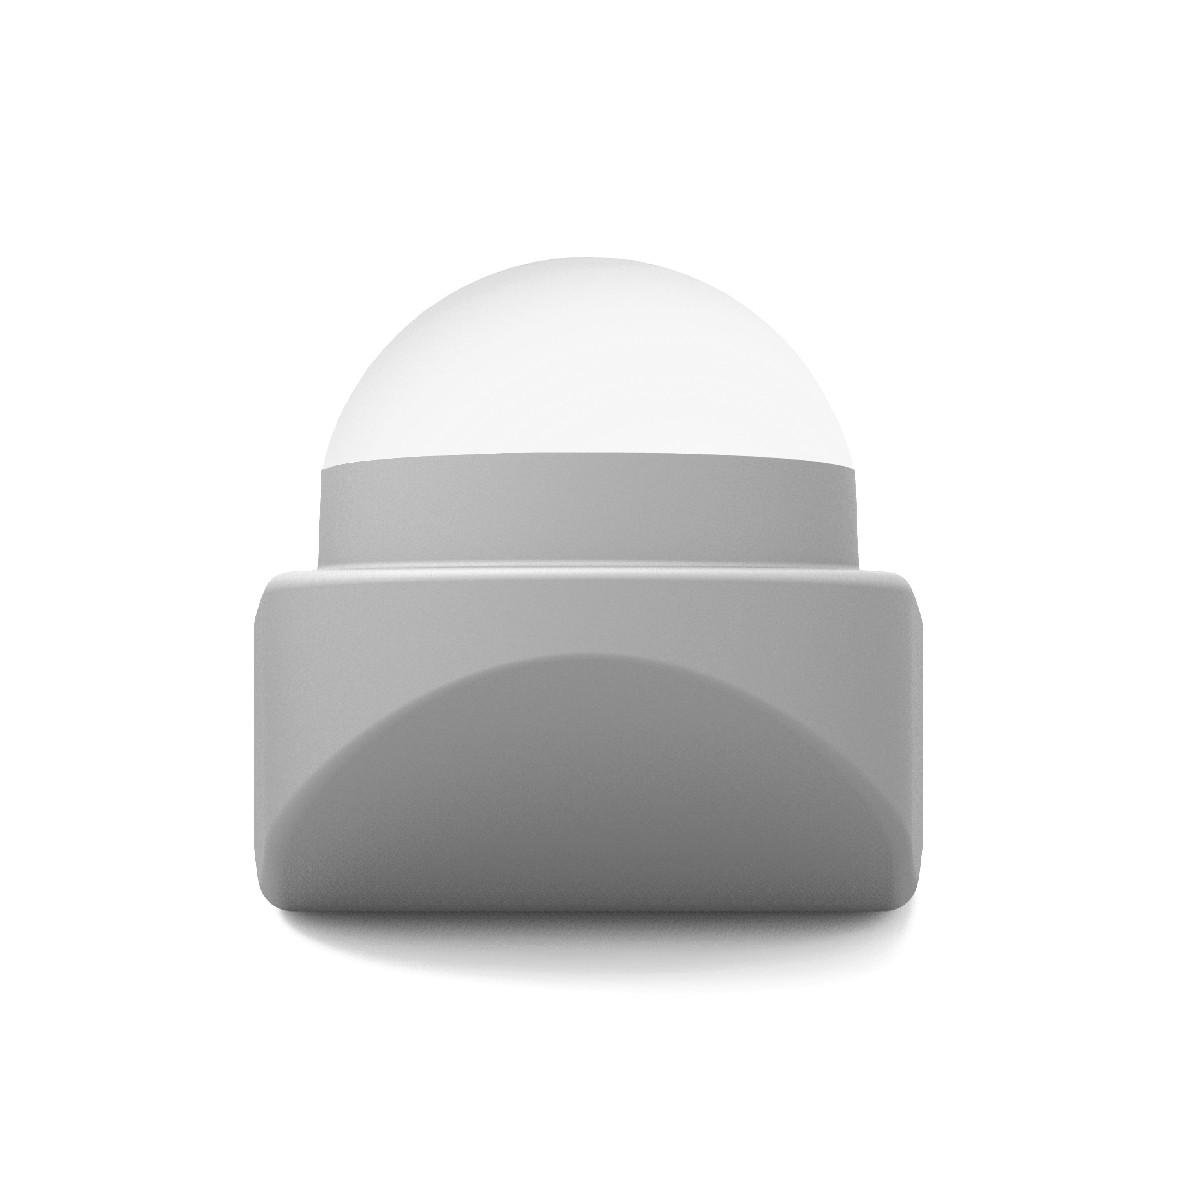 Mobilux Globe Wandleuchte, 1-flg., weiß